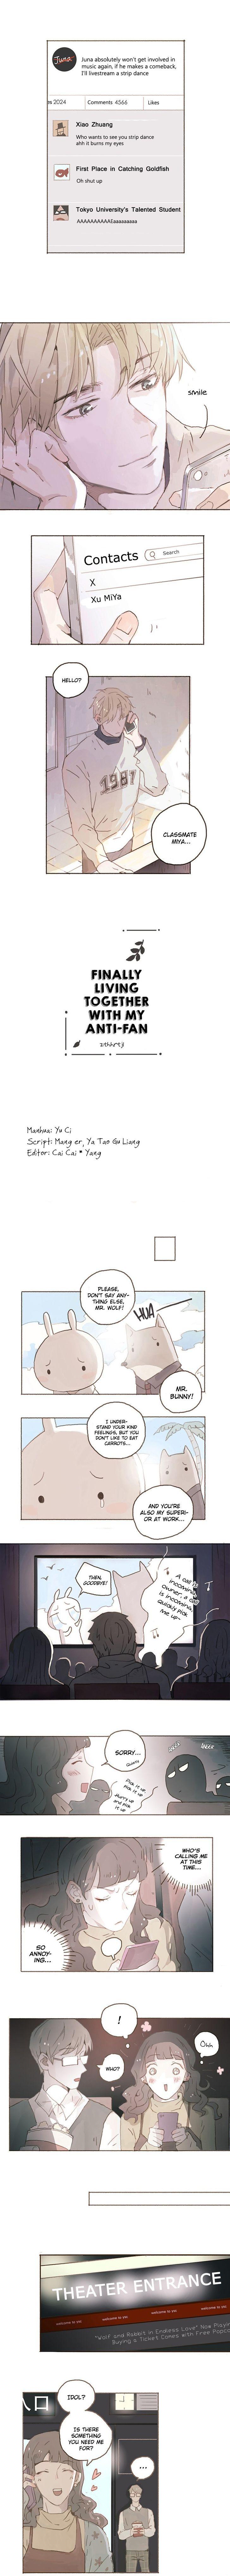 https://im.nineanime.com/comics/pic9/28/20572/423819/FinallyLivingTogetherwithm0592.jpg Page 1